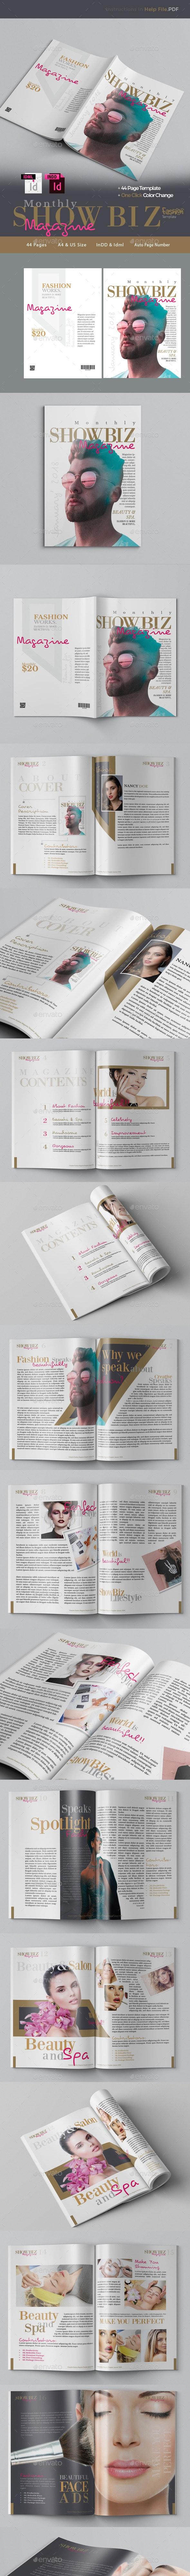 Multipurpose Fashion Magazine Template - Magazines Print Templates